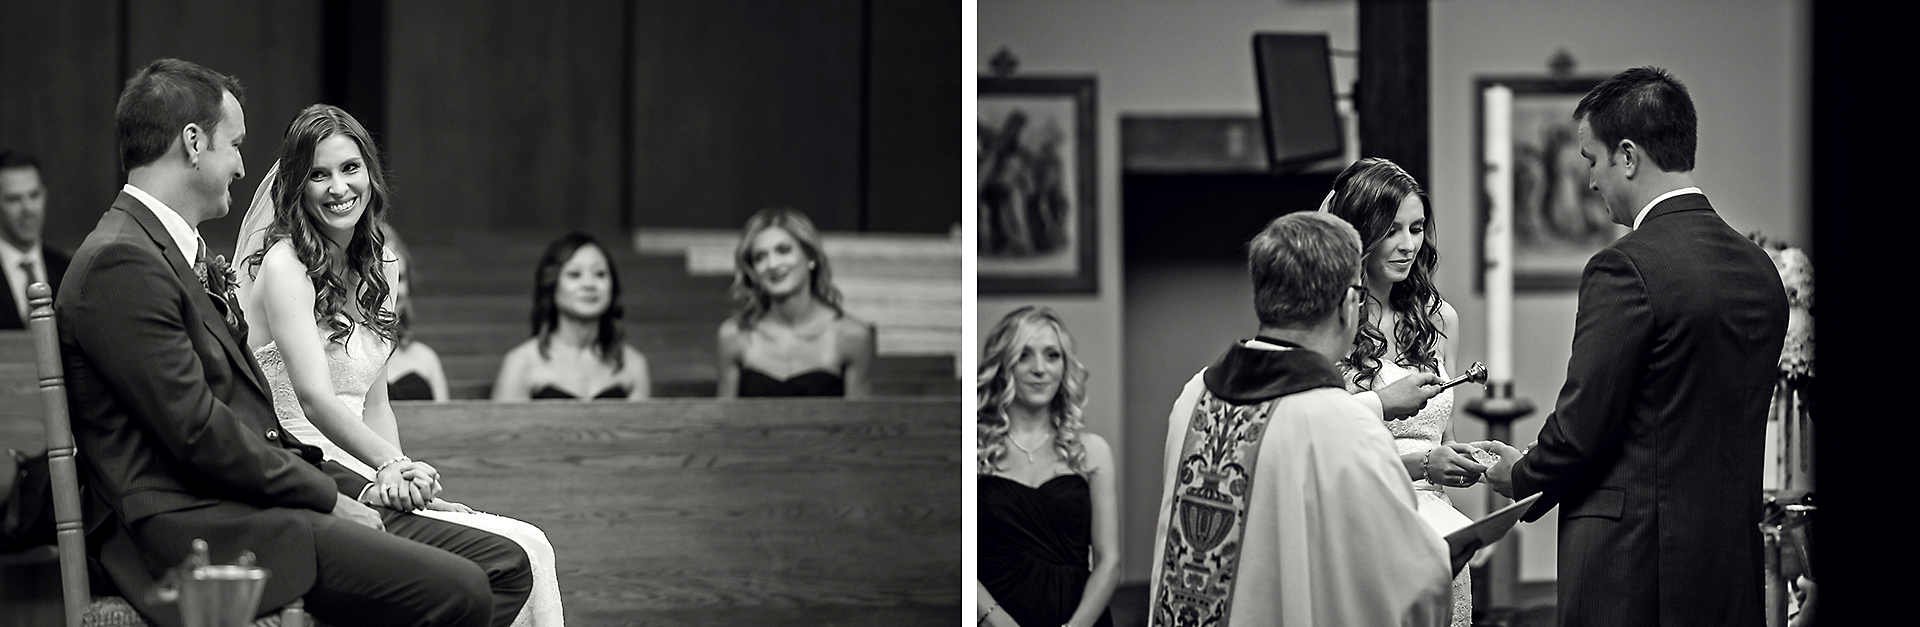 Nathan & Linda | Brooksfield Farms Wedding | Muskoka Wedding Photography13